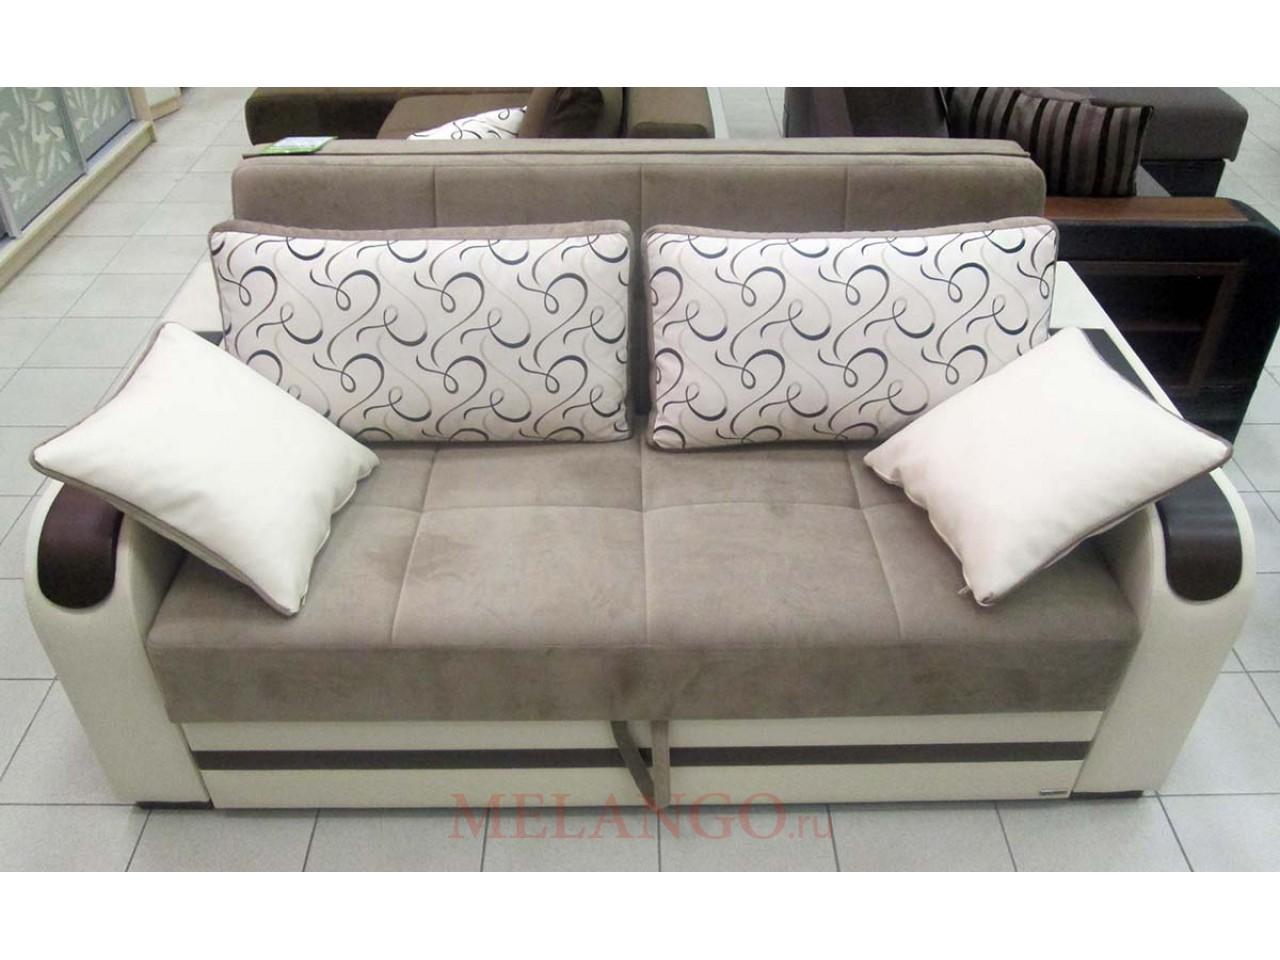 Опорная спинка дивана